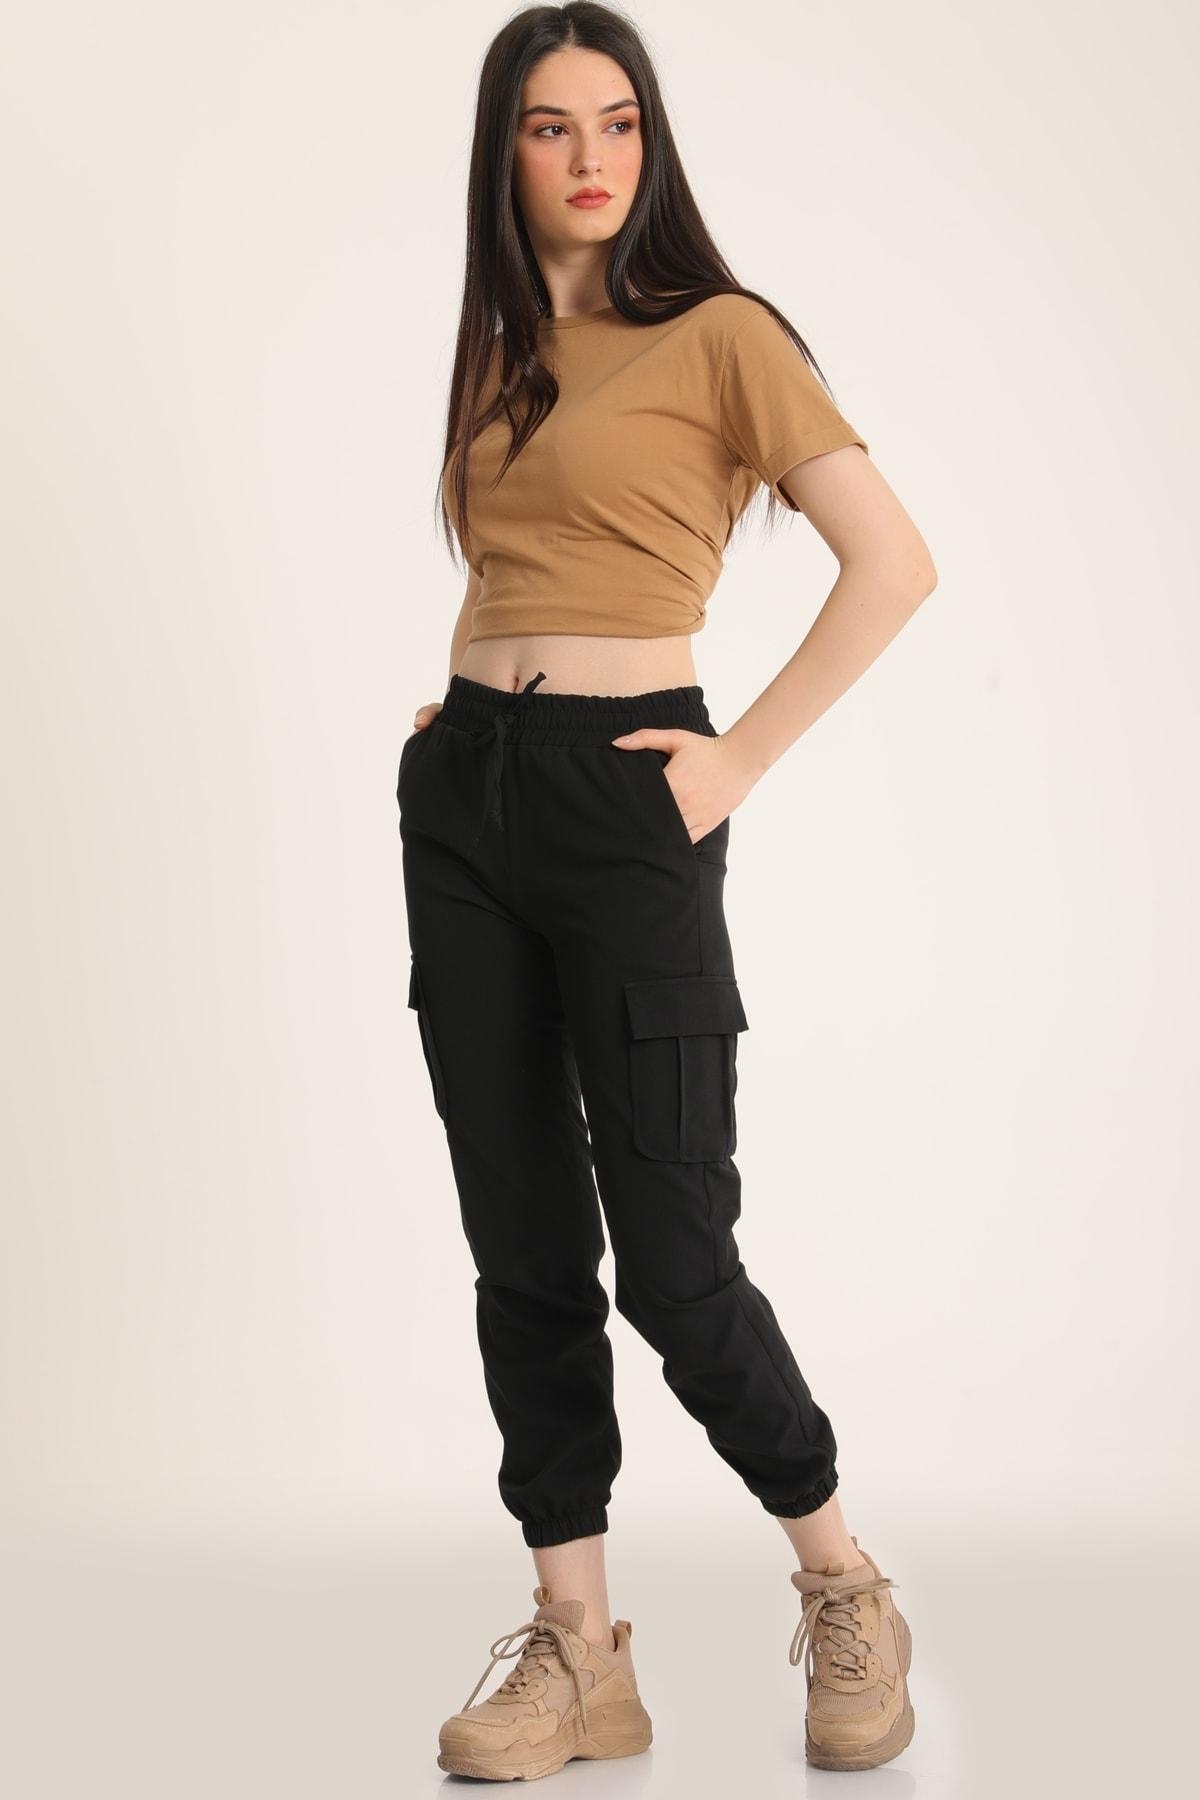 MD trend Kadın Siyah Bel Lastikli Kargo Cepli Pantolon Mdt5296 1